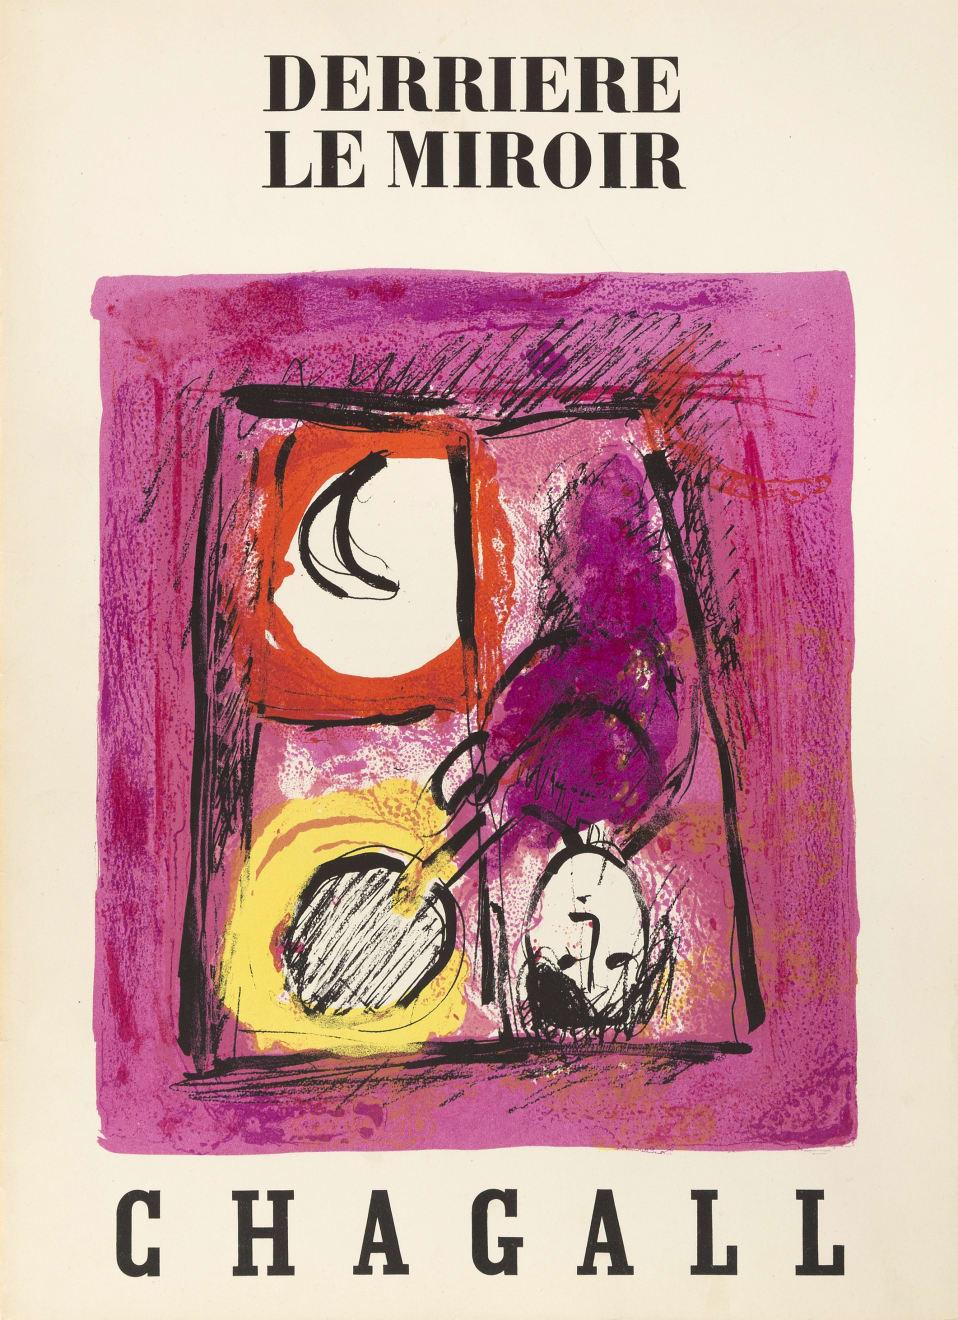 Summer Auction 2020, LOT 23 - Marc Chagall - 'From Derrière Le Miroir' , 1957